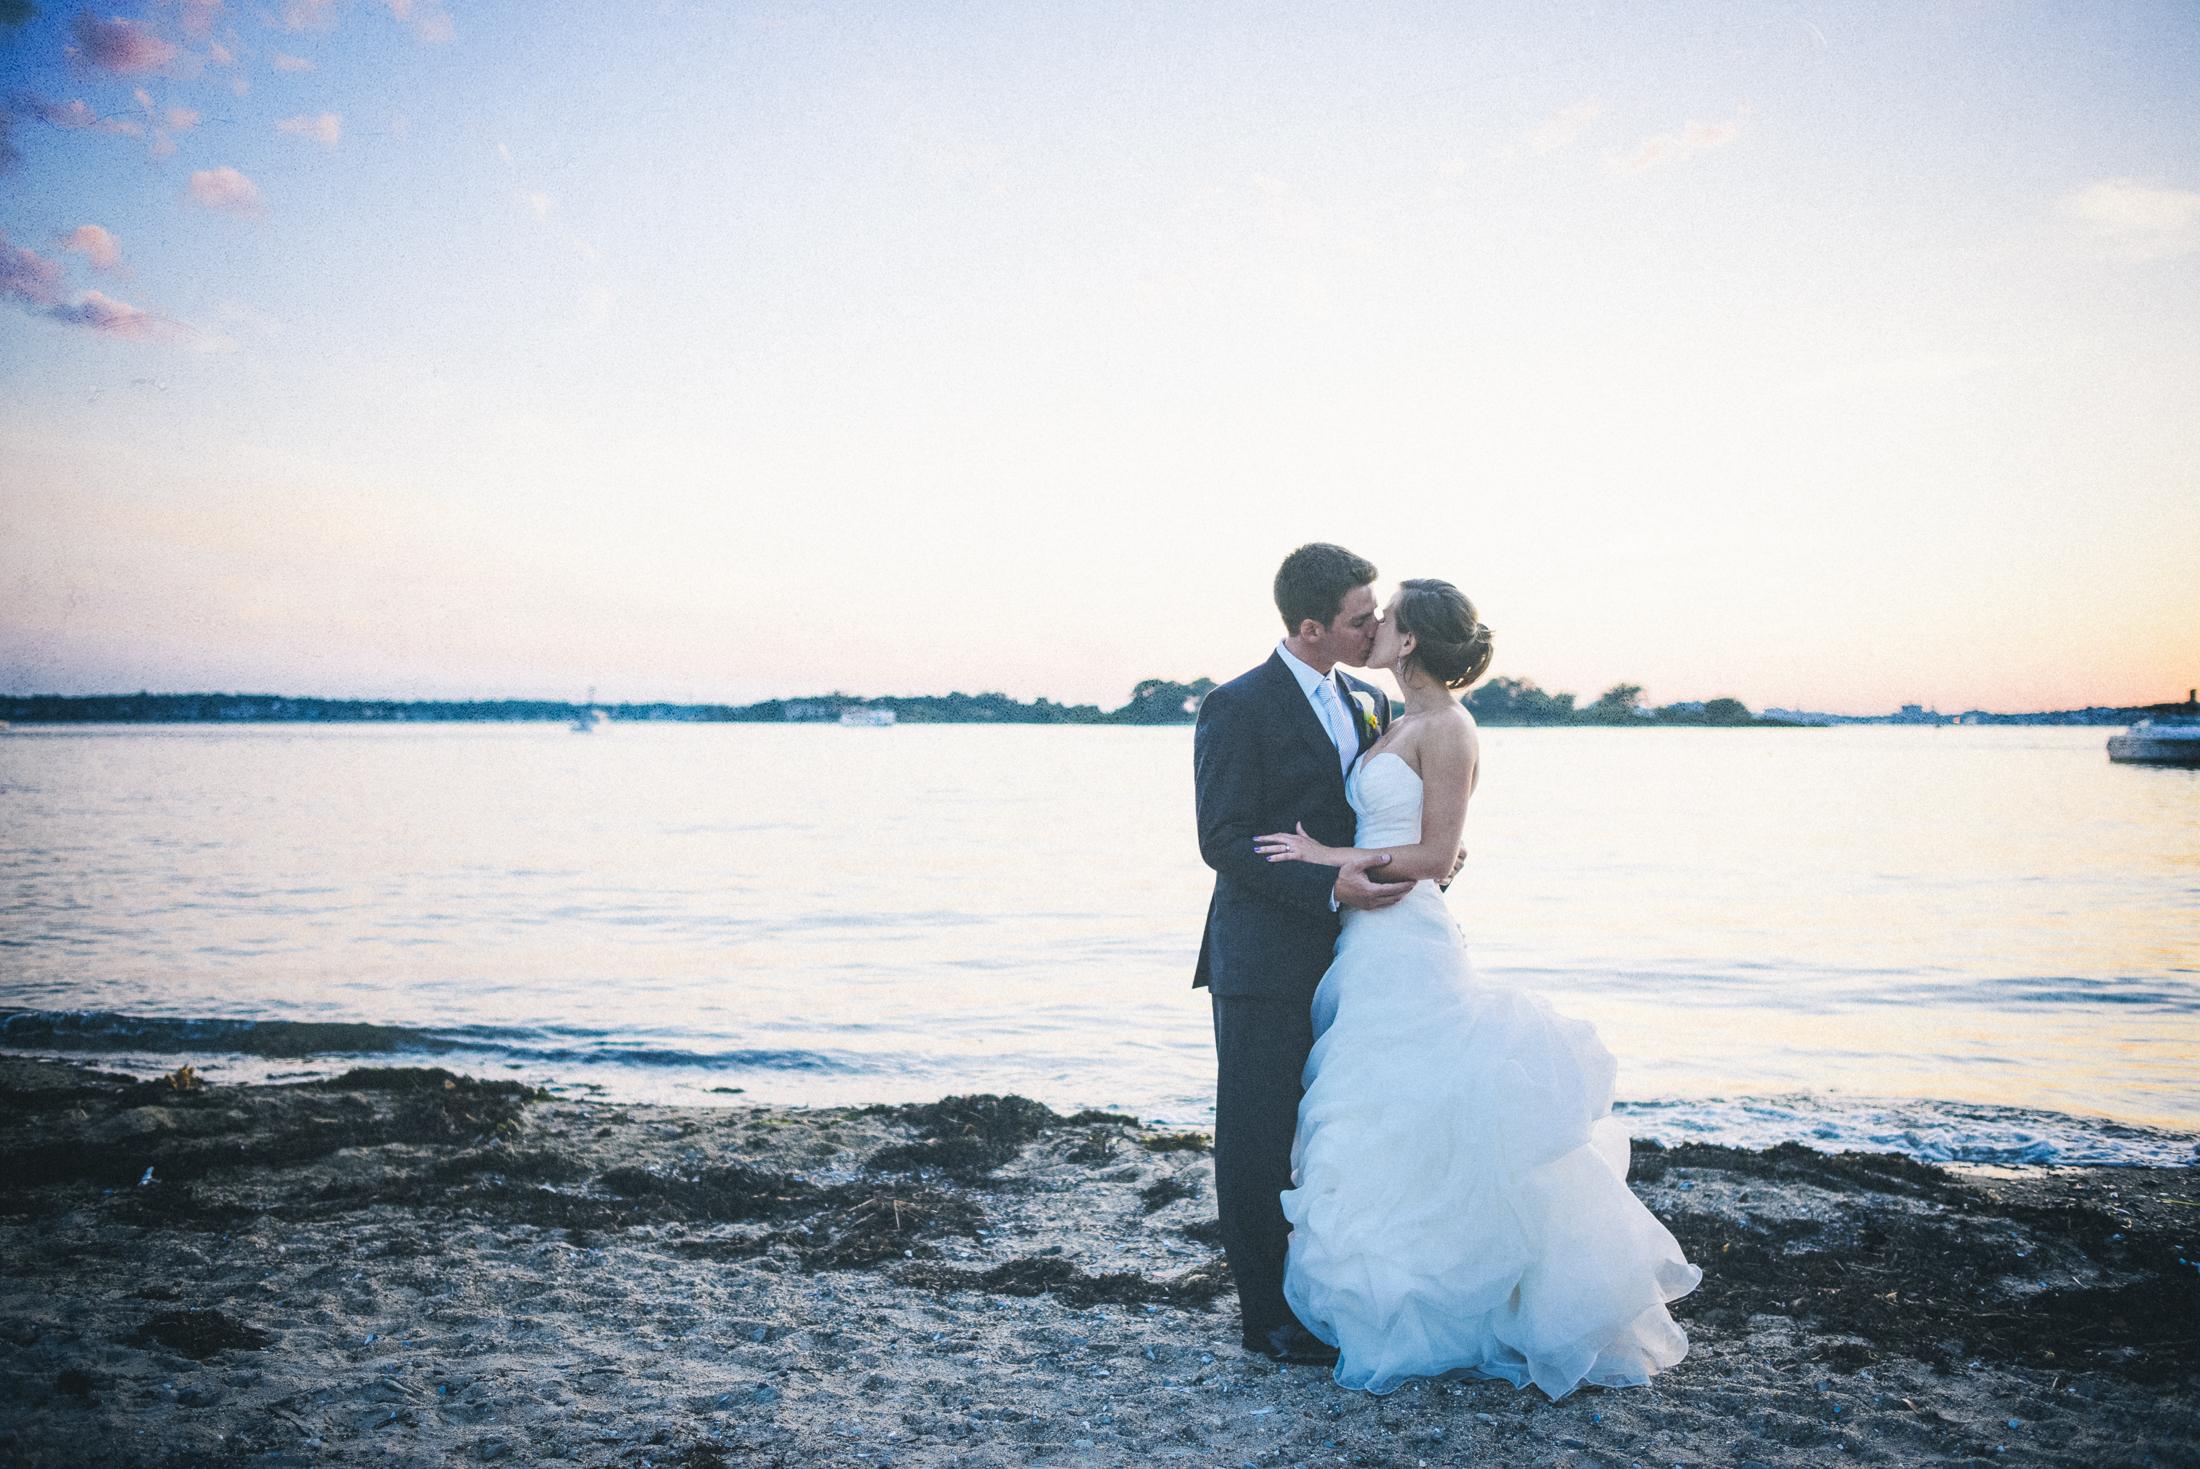 NH Wedding Photographer: Inn on Peaks Island couple on the rocks